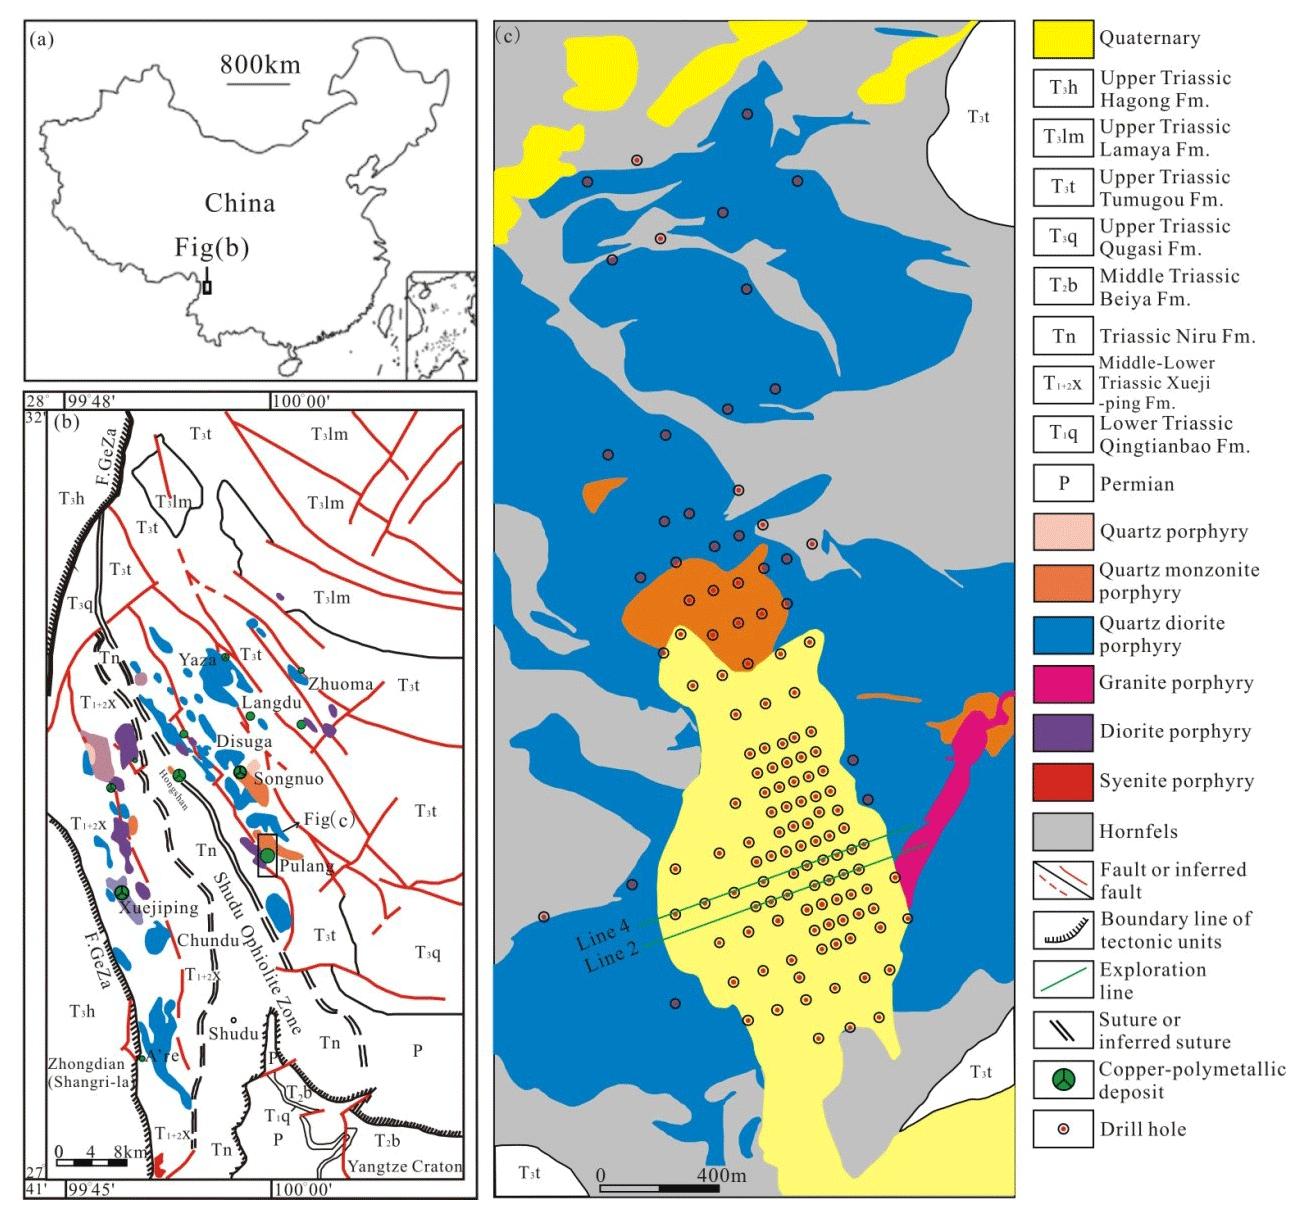 NPG Application of fractal models to delineate mineralized